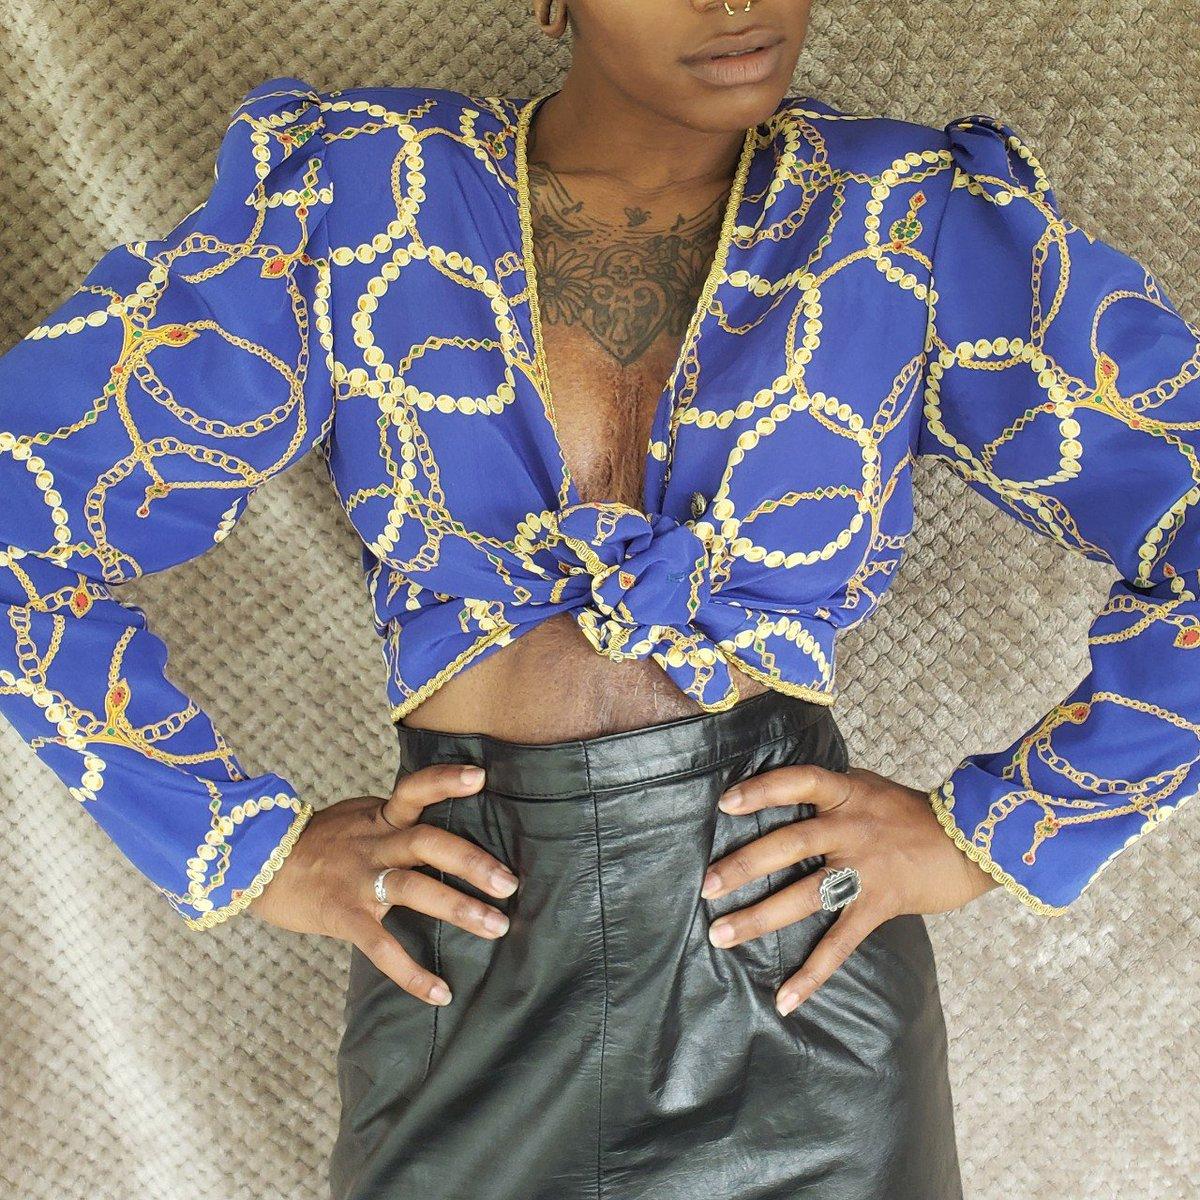 0ed6ecc7dd34f https   depop.app.link z0sVwAubaP  denim  vintage  handpainted  black  jeans   distressed  depop  depopseller  topseller  vintage  shopping  shop   clothes ...